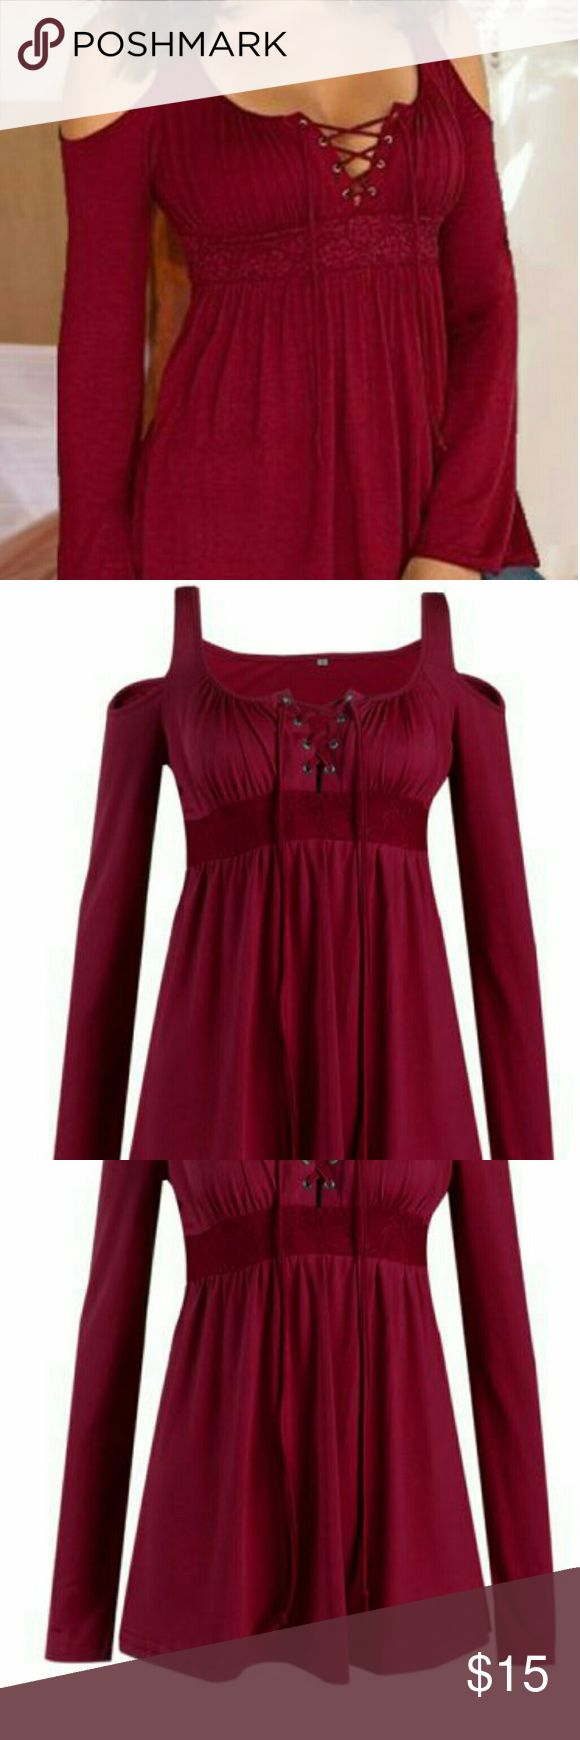 Top Burgundy long sleeve lace bandage hollow shoulder top Tops Blouses